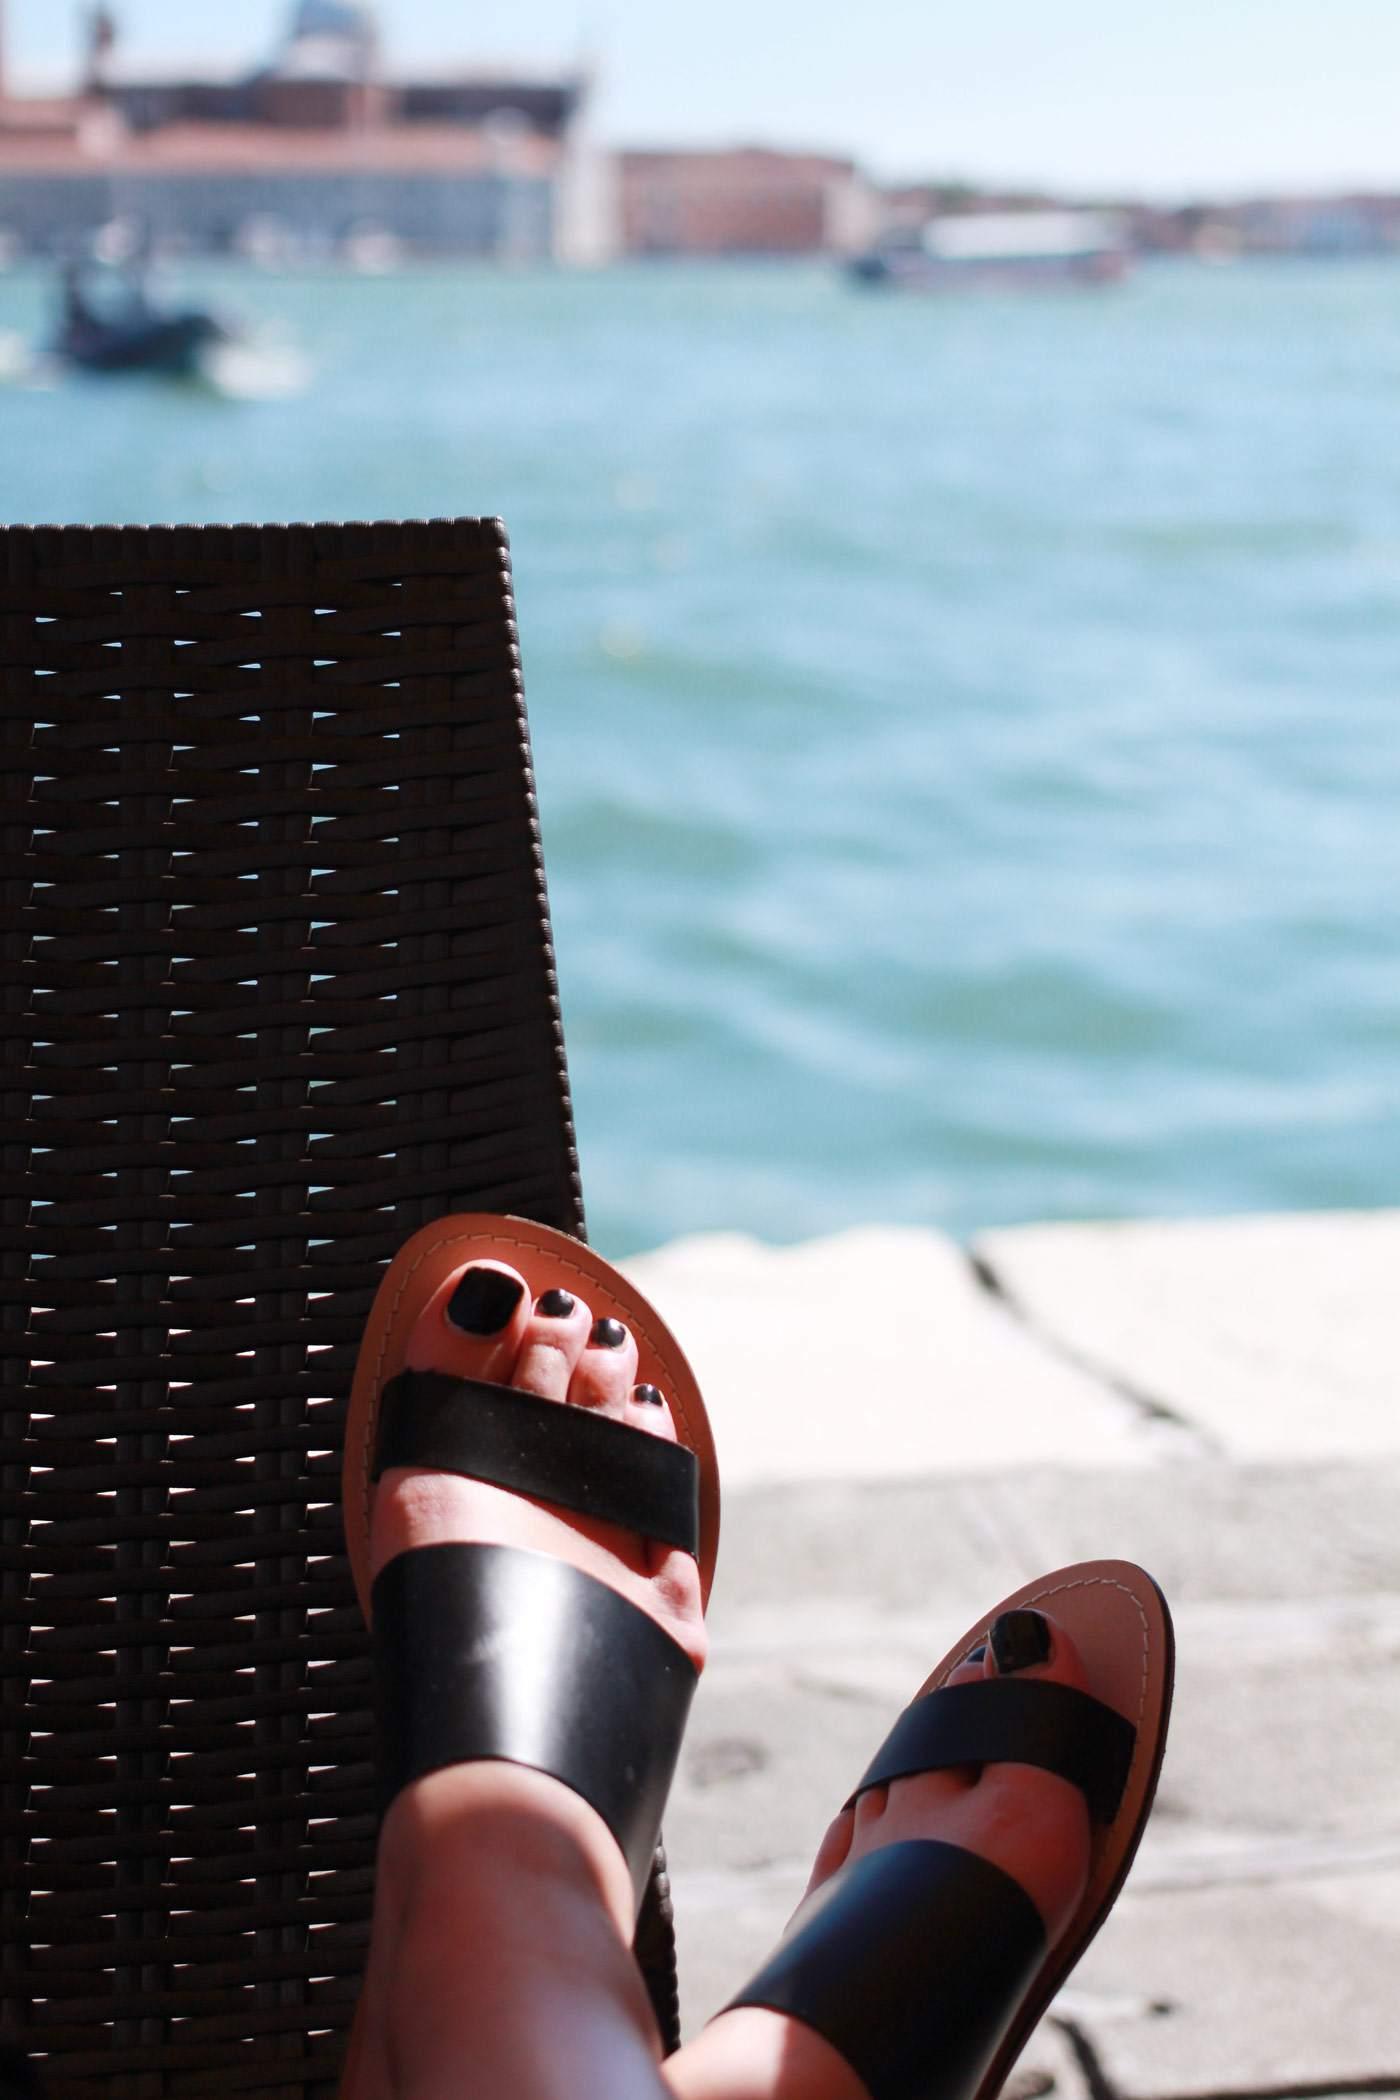 venice-italy-canal-gondola-photography-travel-blogger-san-marco-14